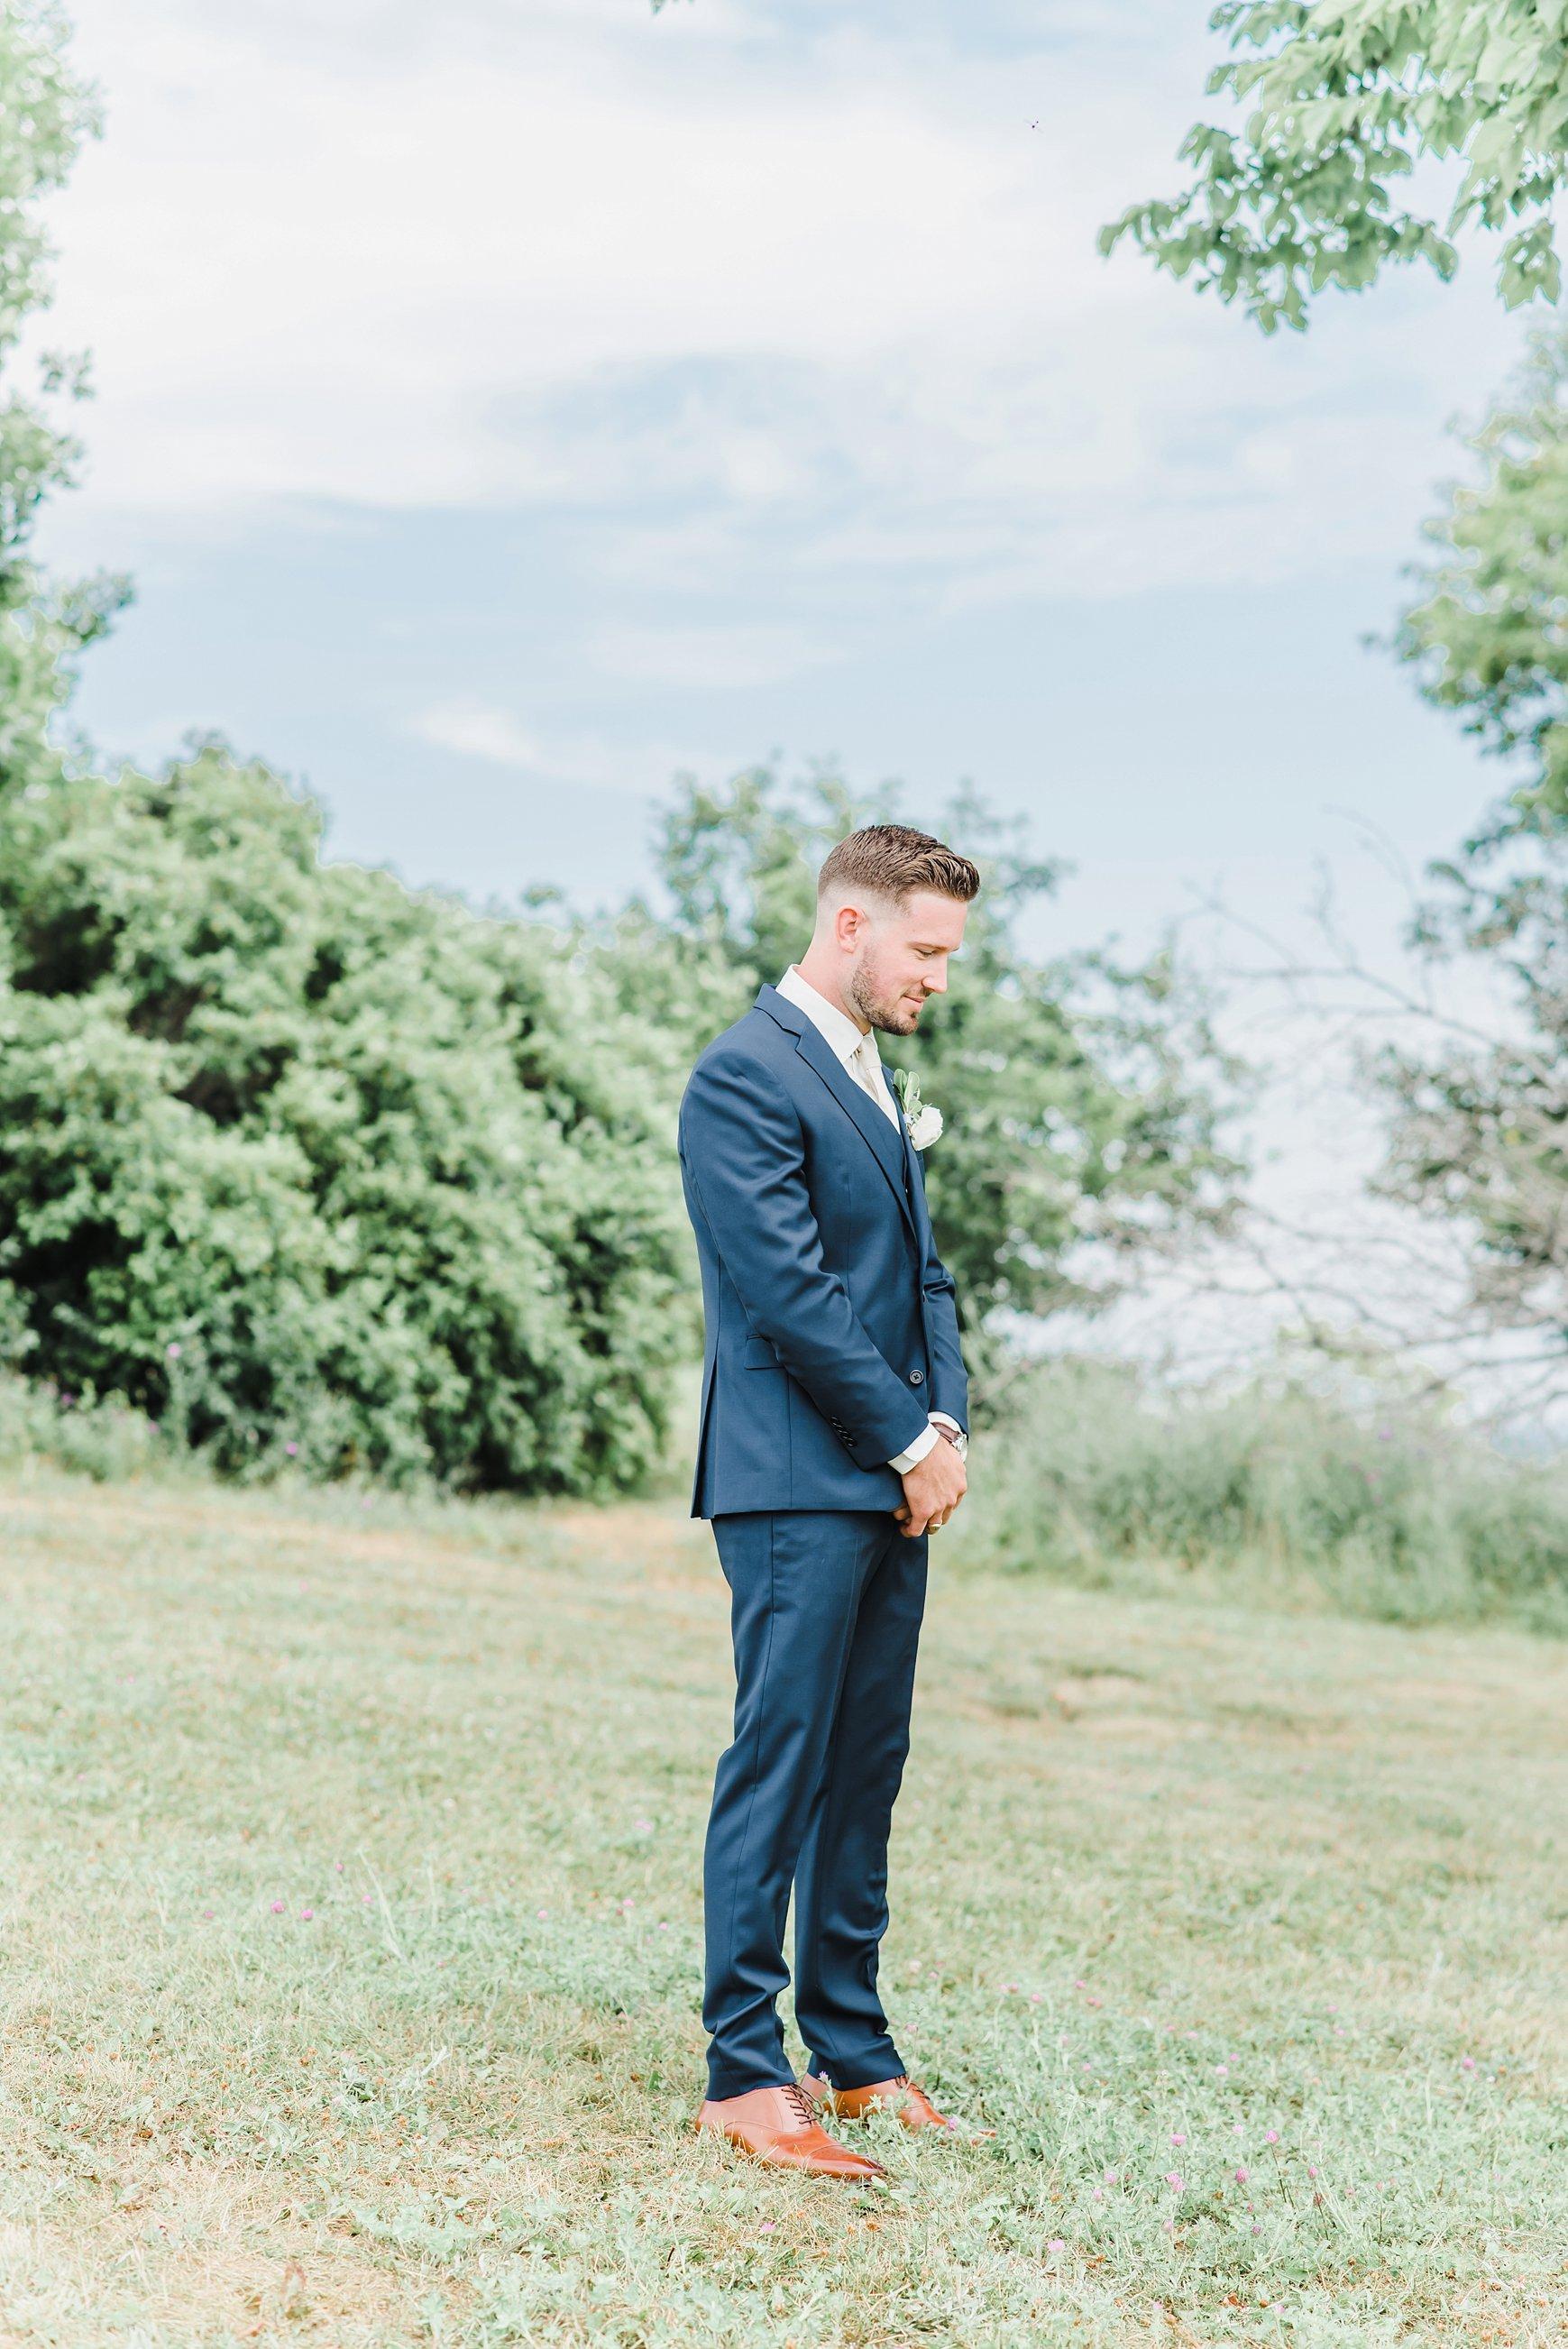 light airy indie fine art ottawa wedding photographer | Ali and Batoul Photography_0150.jpg